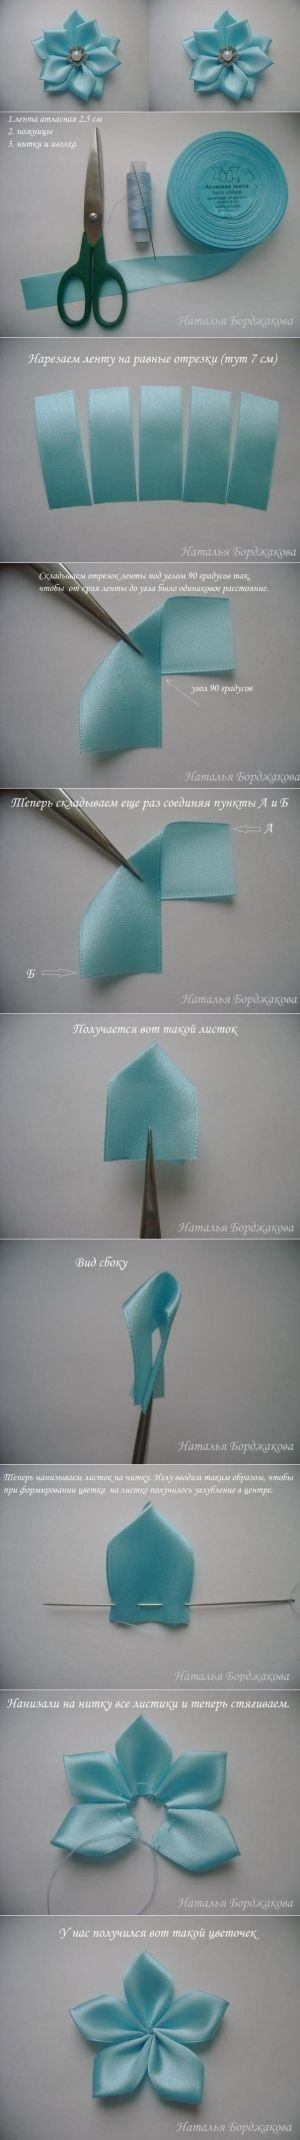 DIY Pointed Petals Ribbon Flower DIY Pointed Petals Ribbon Flower by diyforever